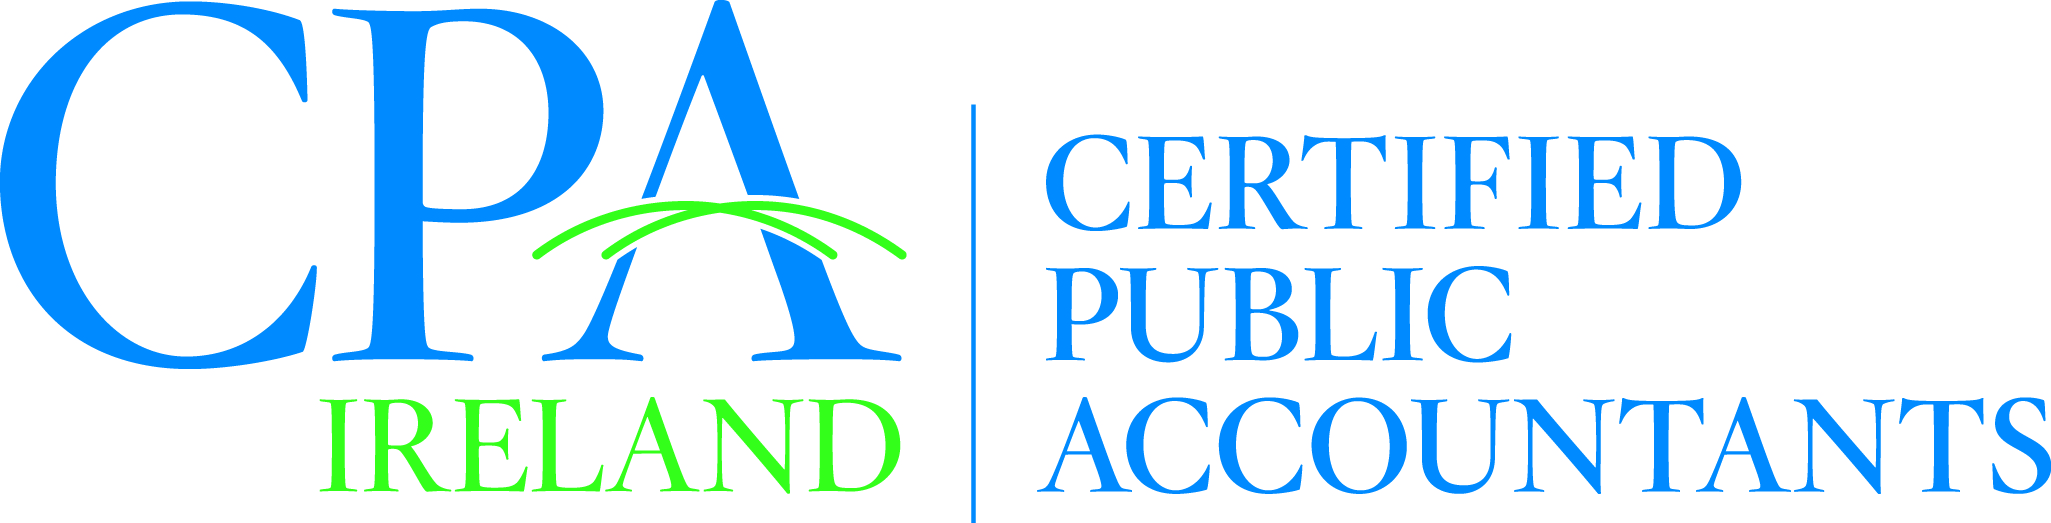 file cpa ireland logo 2013 jpg wikimedia commons